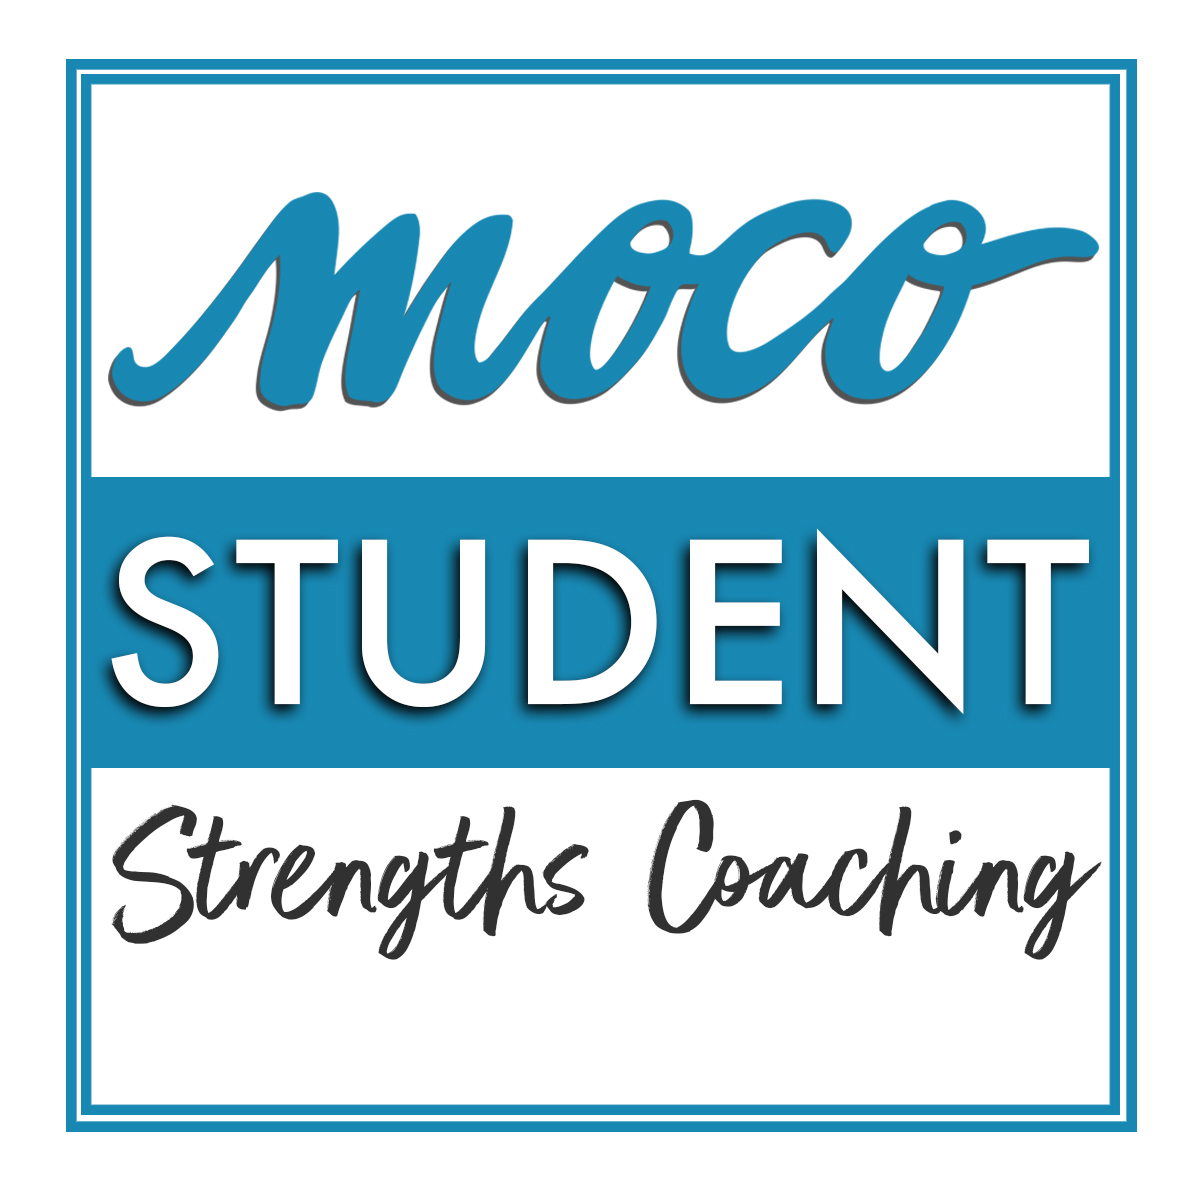 Moco Student Strengths Coaching.jpg